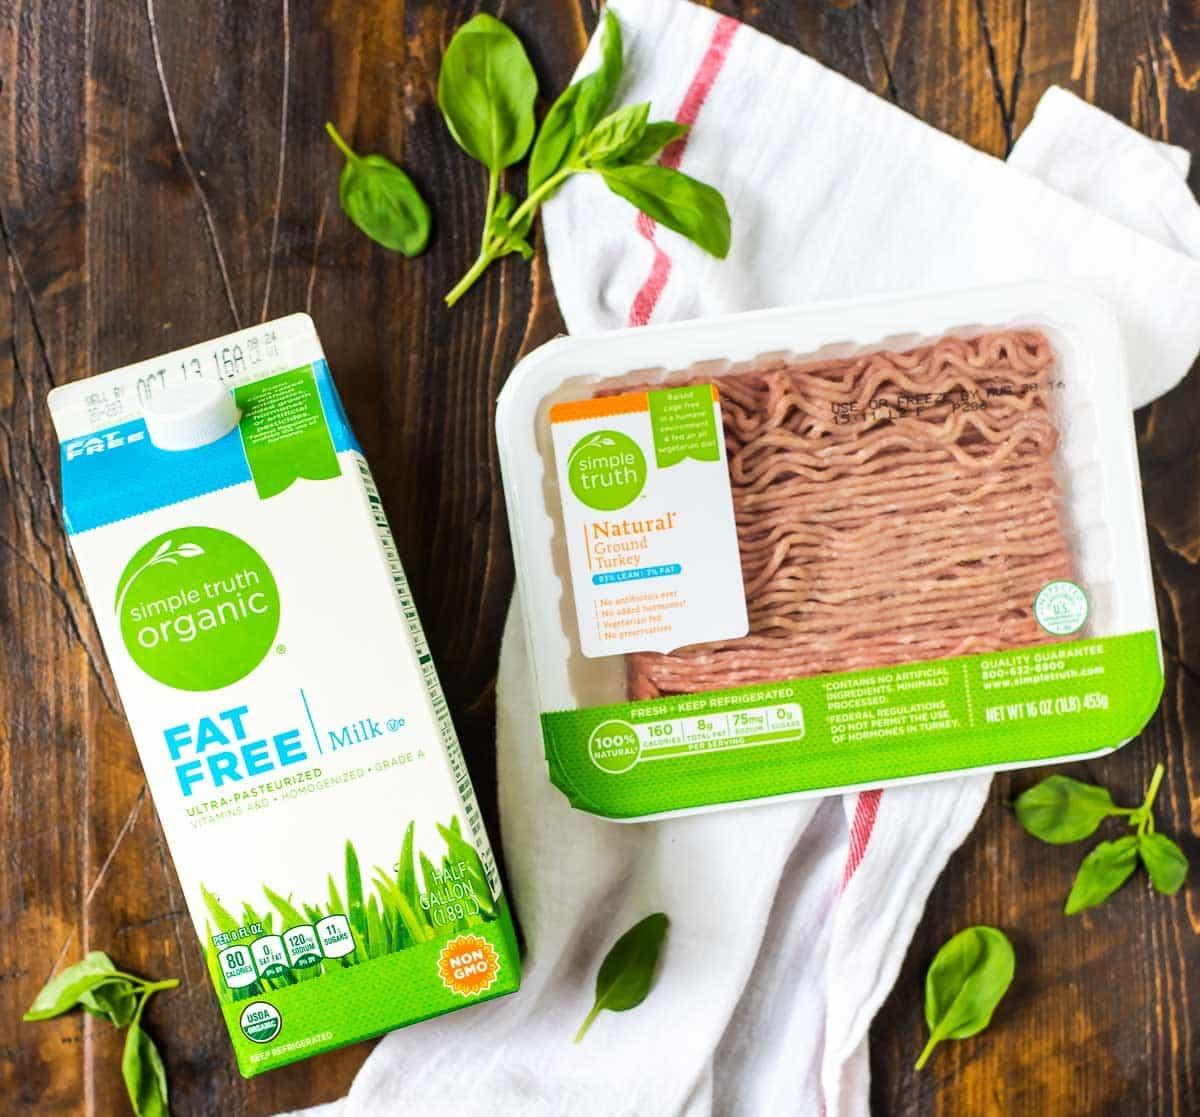 Simple Truth organic ground turkey and fat free milk